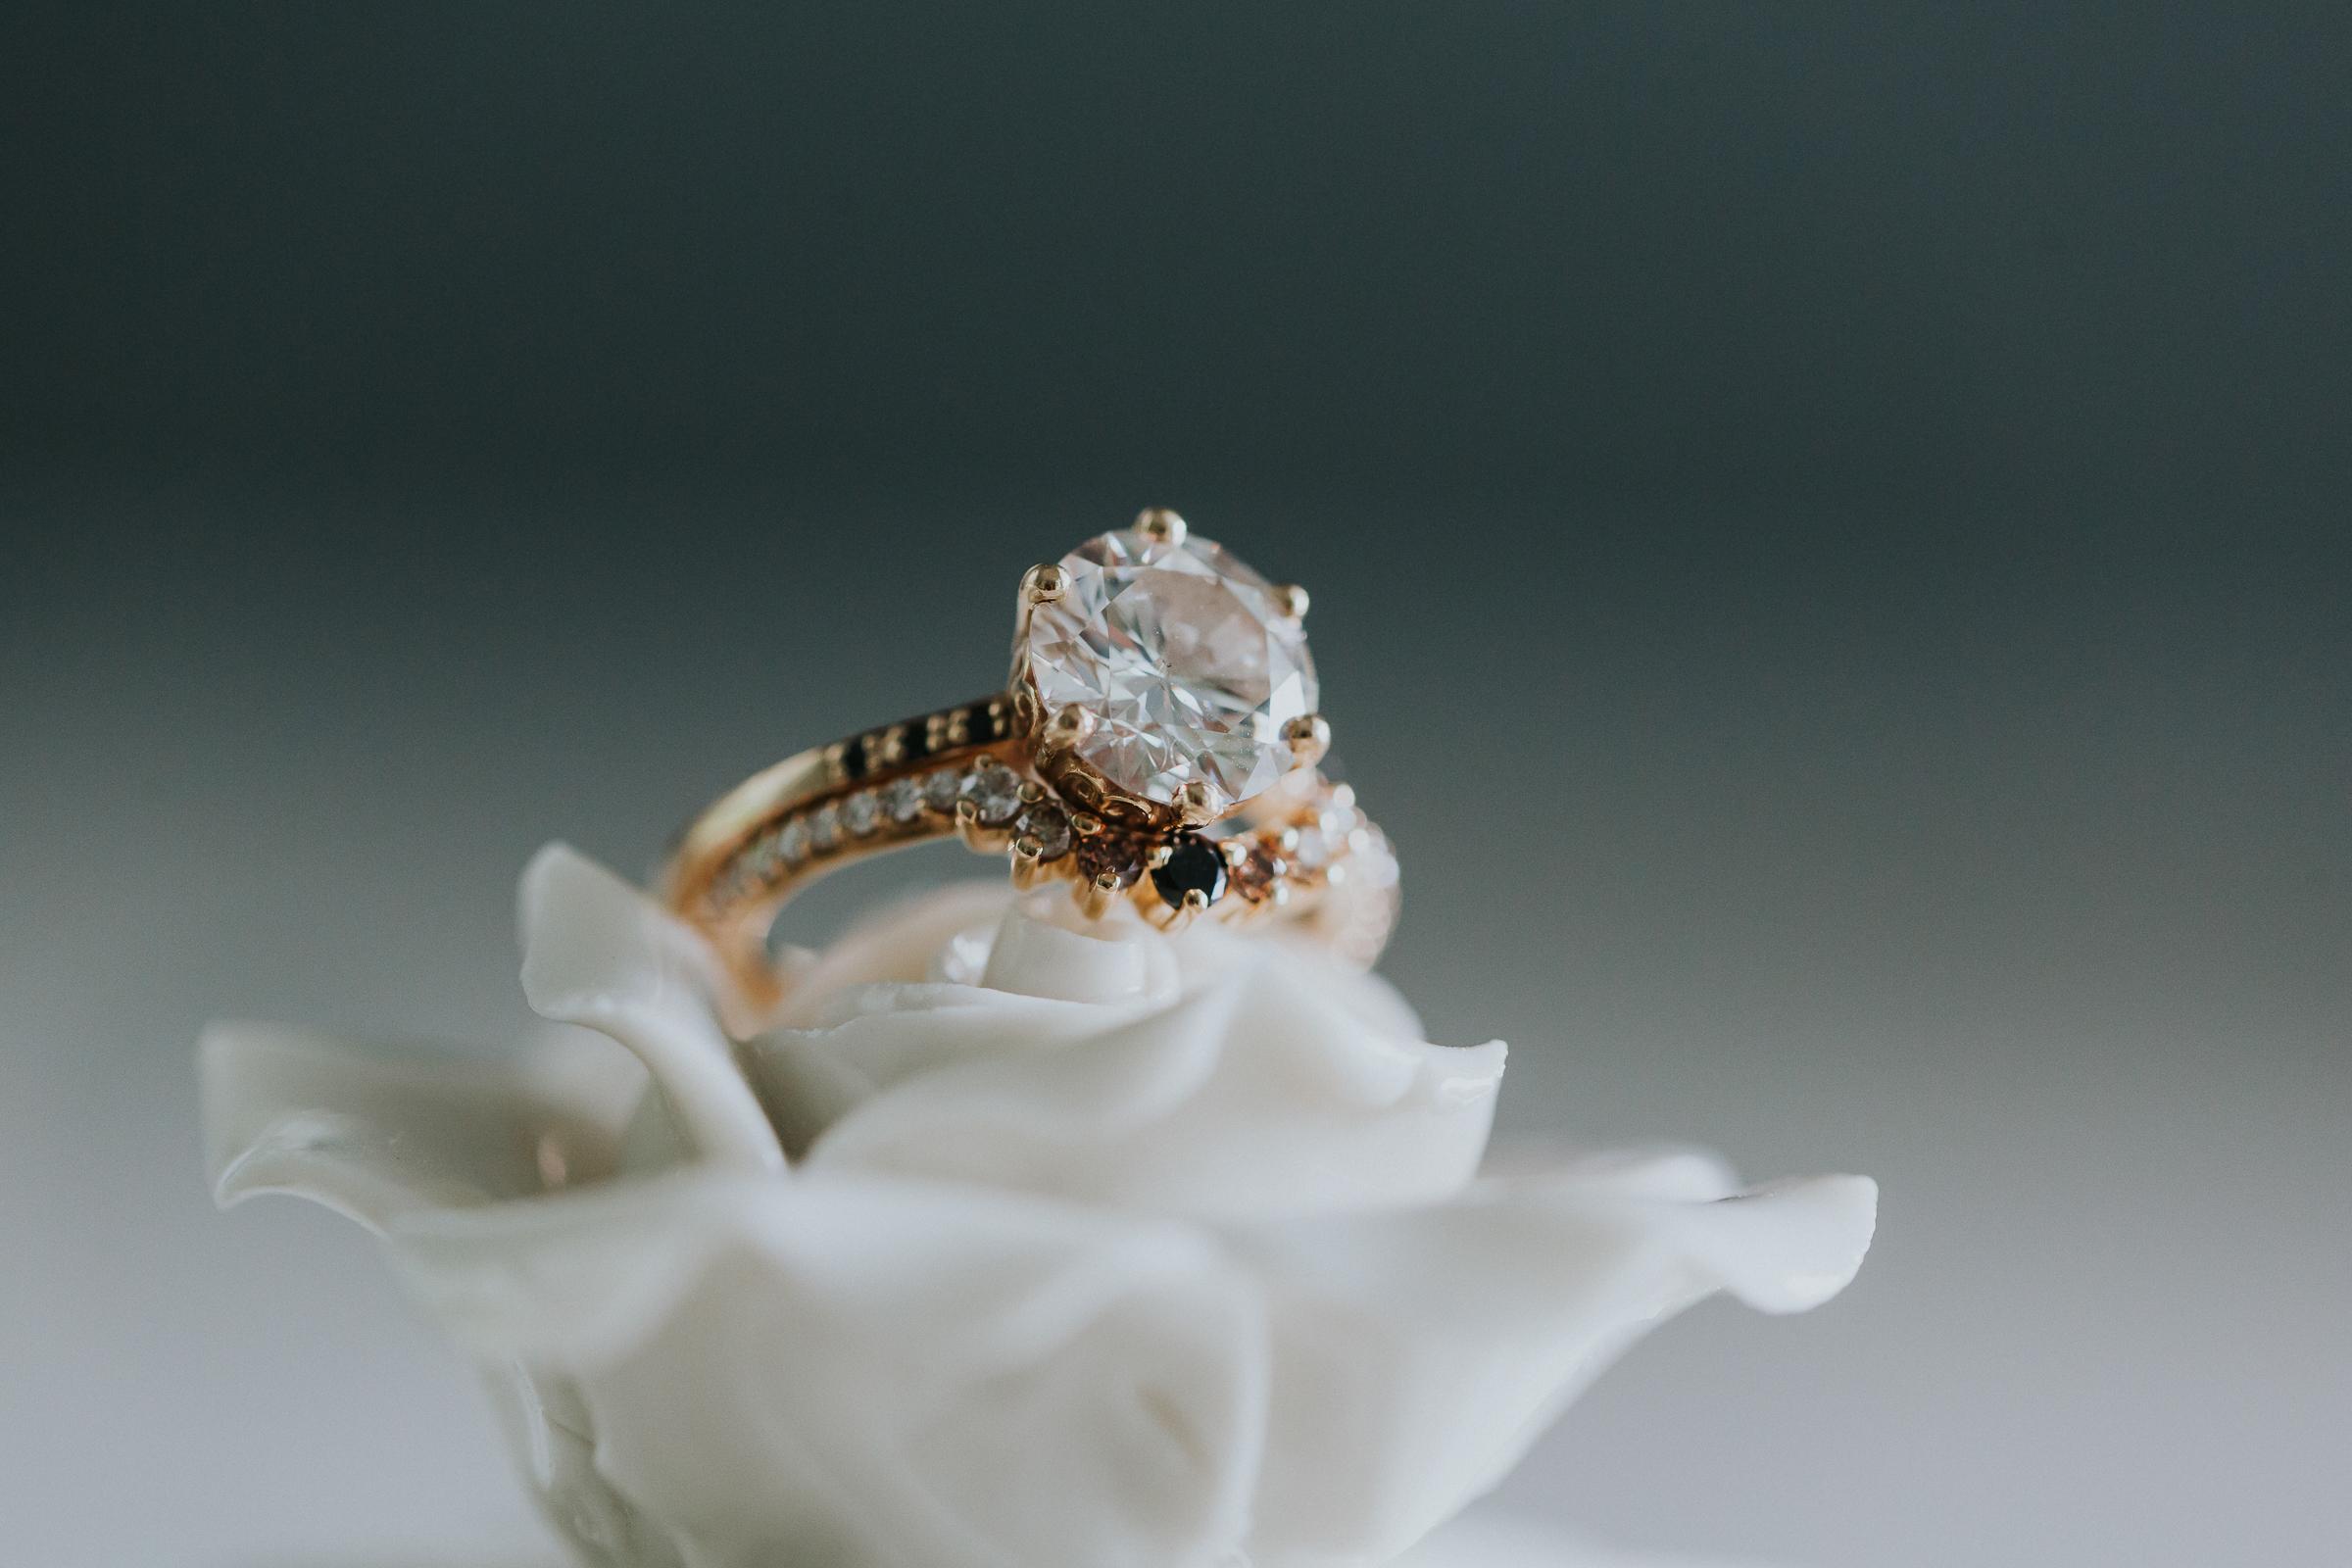 Handsome-Hollow-Long-Eddy-Catskills-New-York-Fine-Art-Documentary-Wedding-Photographer-3.jpg